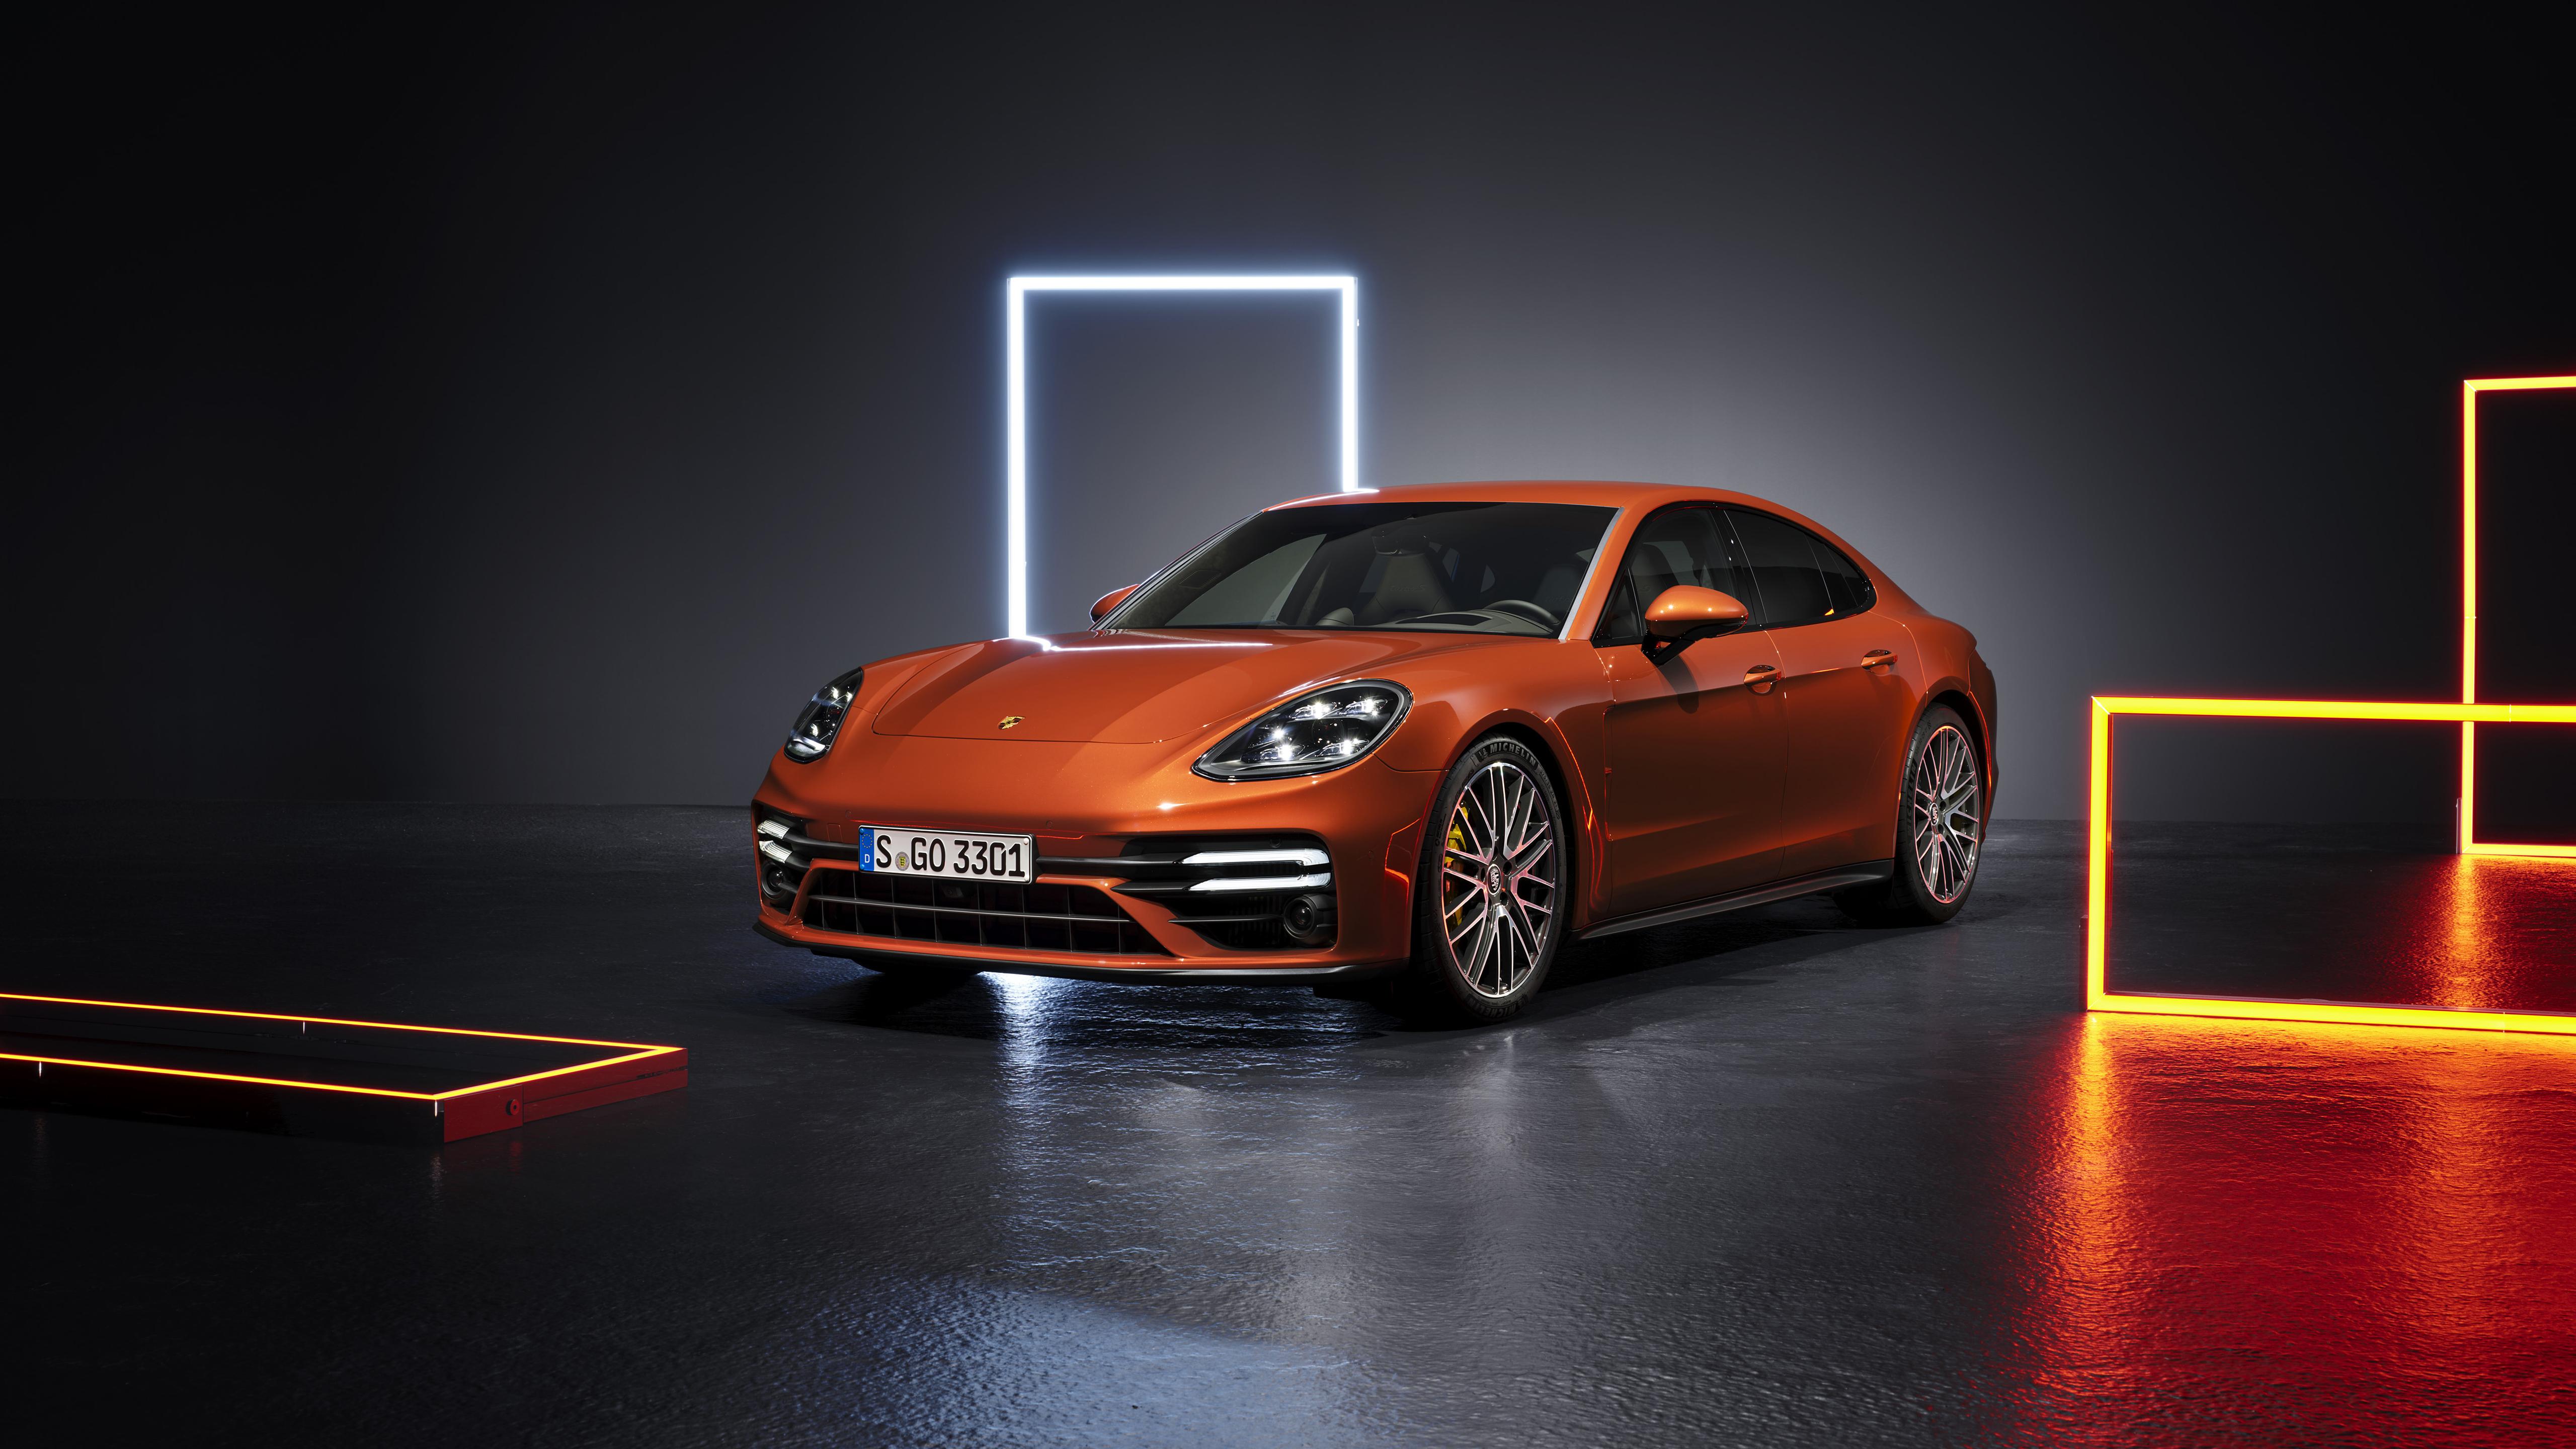 Porsche Panamera Turbo S 2020 5K 2 Wallpaper | HD Car ...